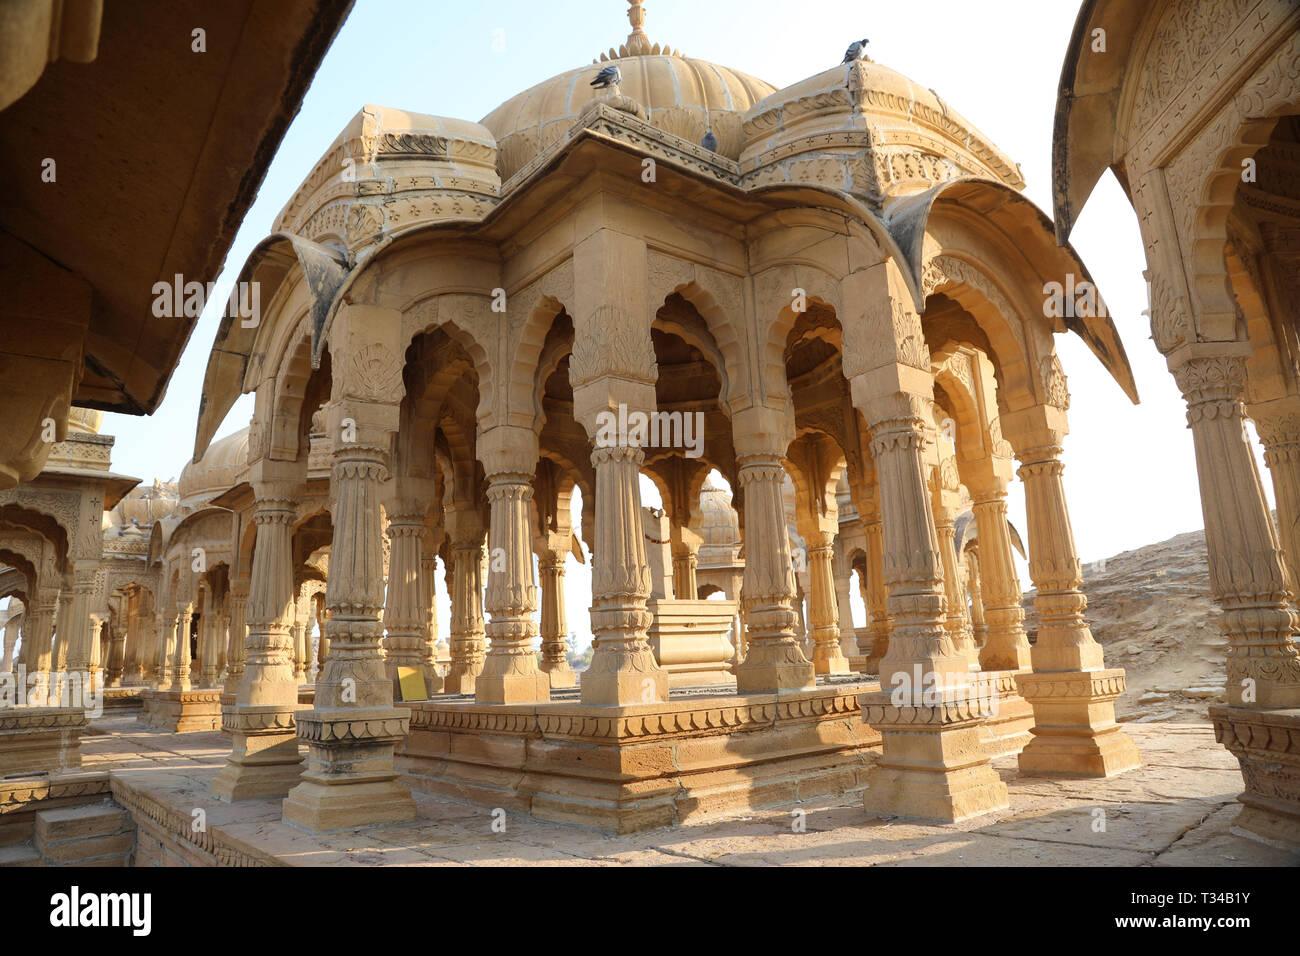 Bada Bagh, Jaisalmer, Rajasthan, India --- Cenotaphs old burial site of the rulers of jaisalmer Desert - Stock Image